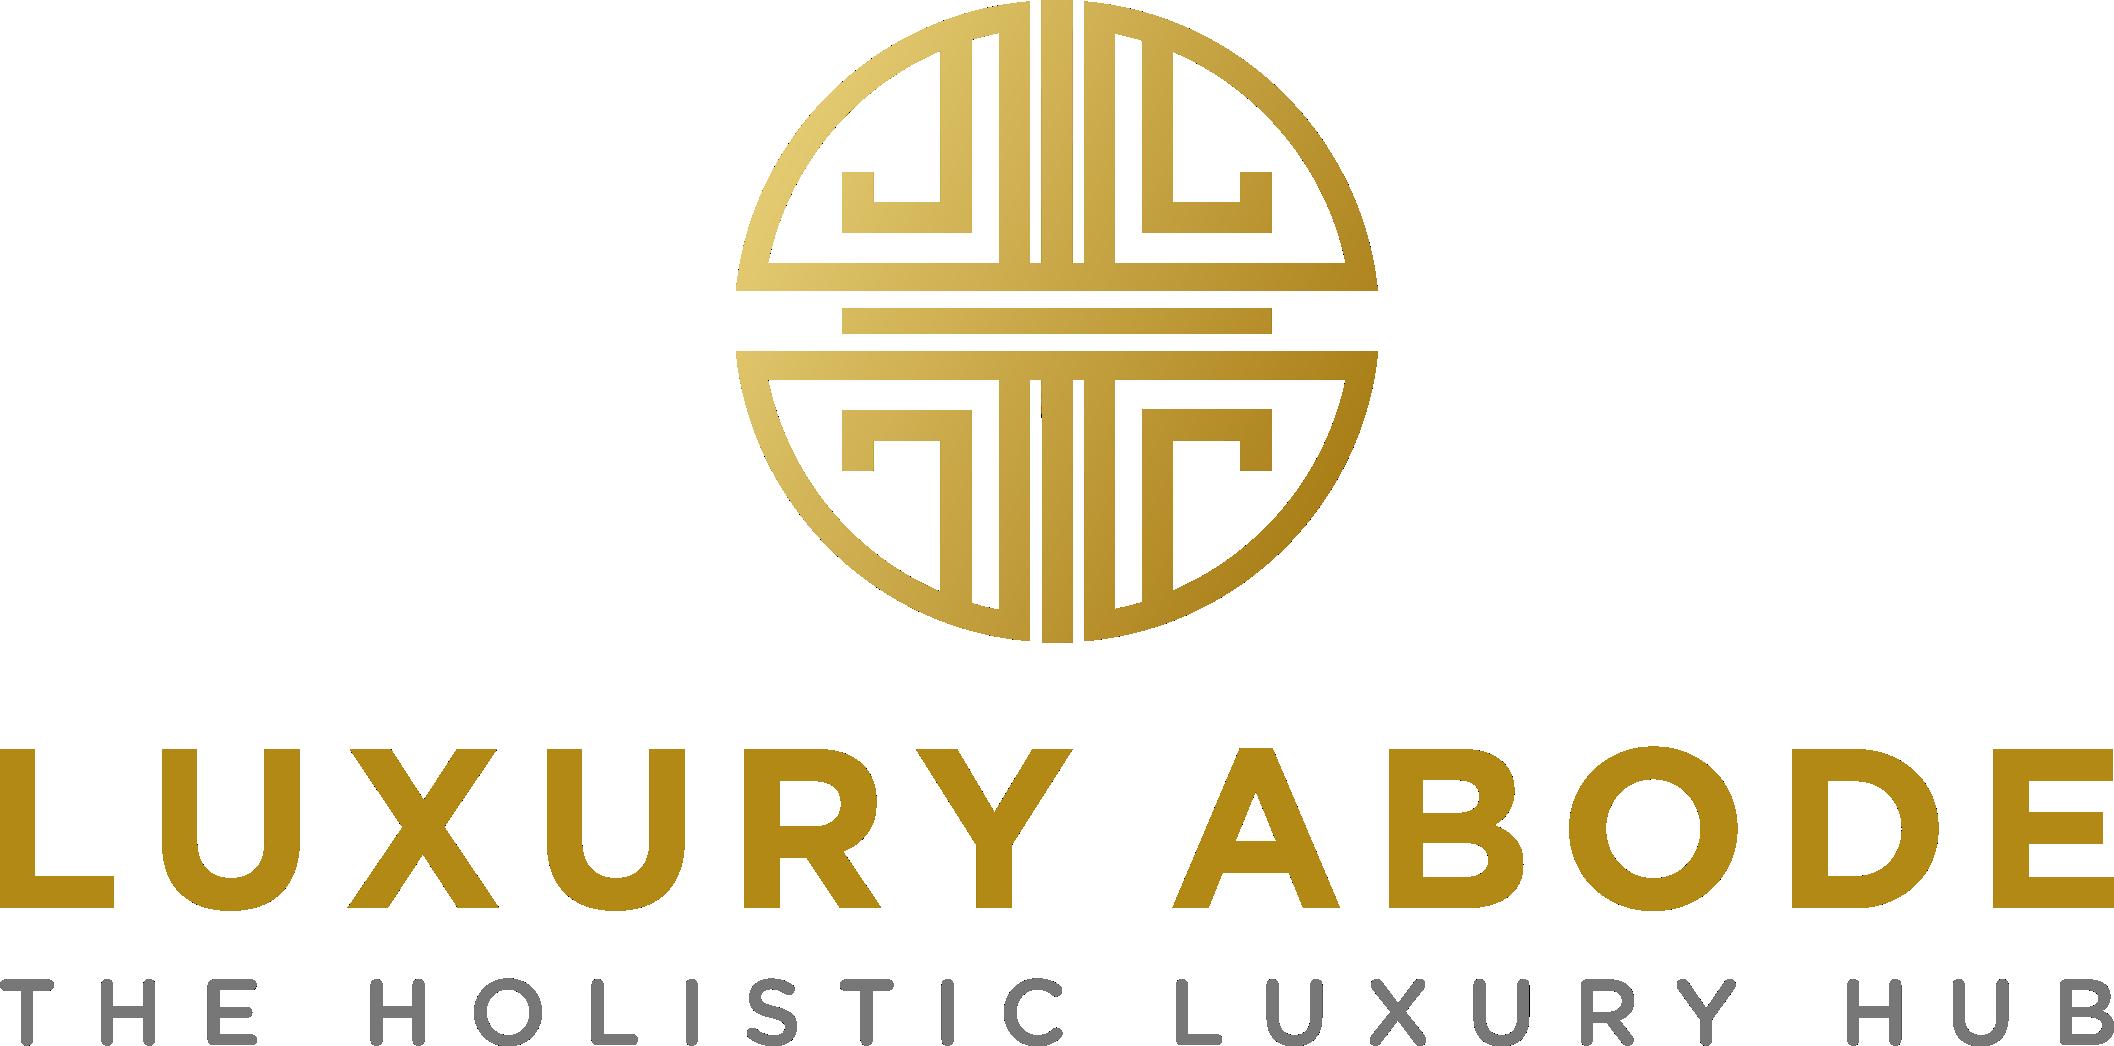 Luxury Abode